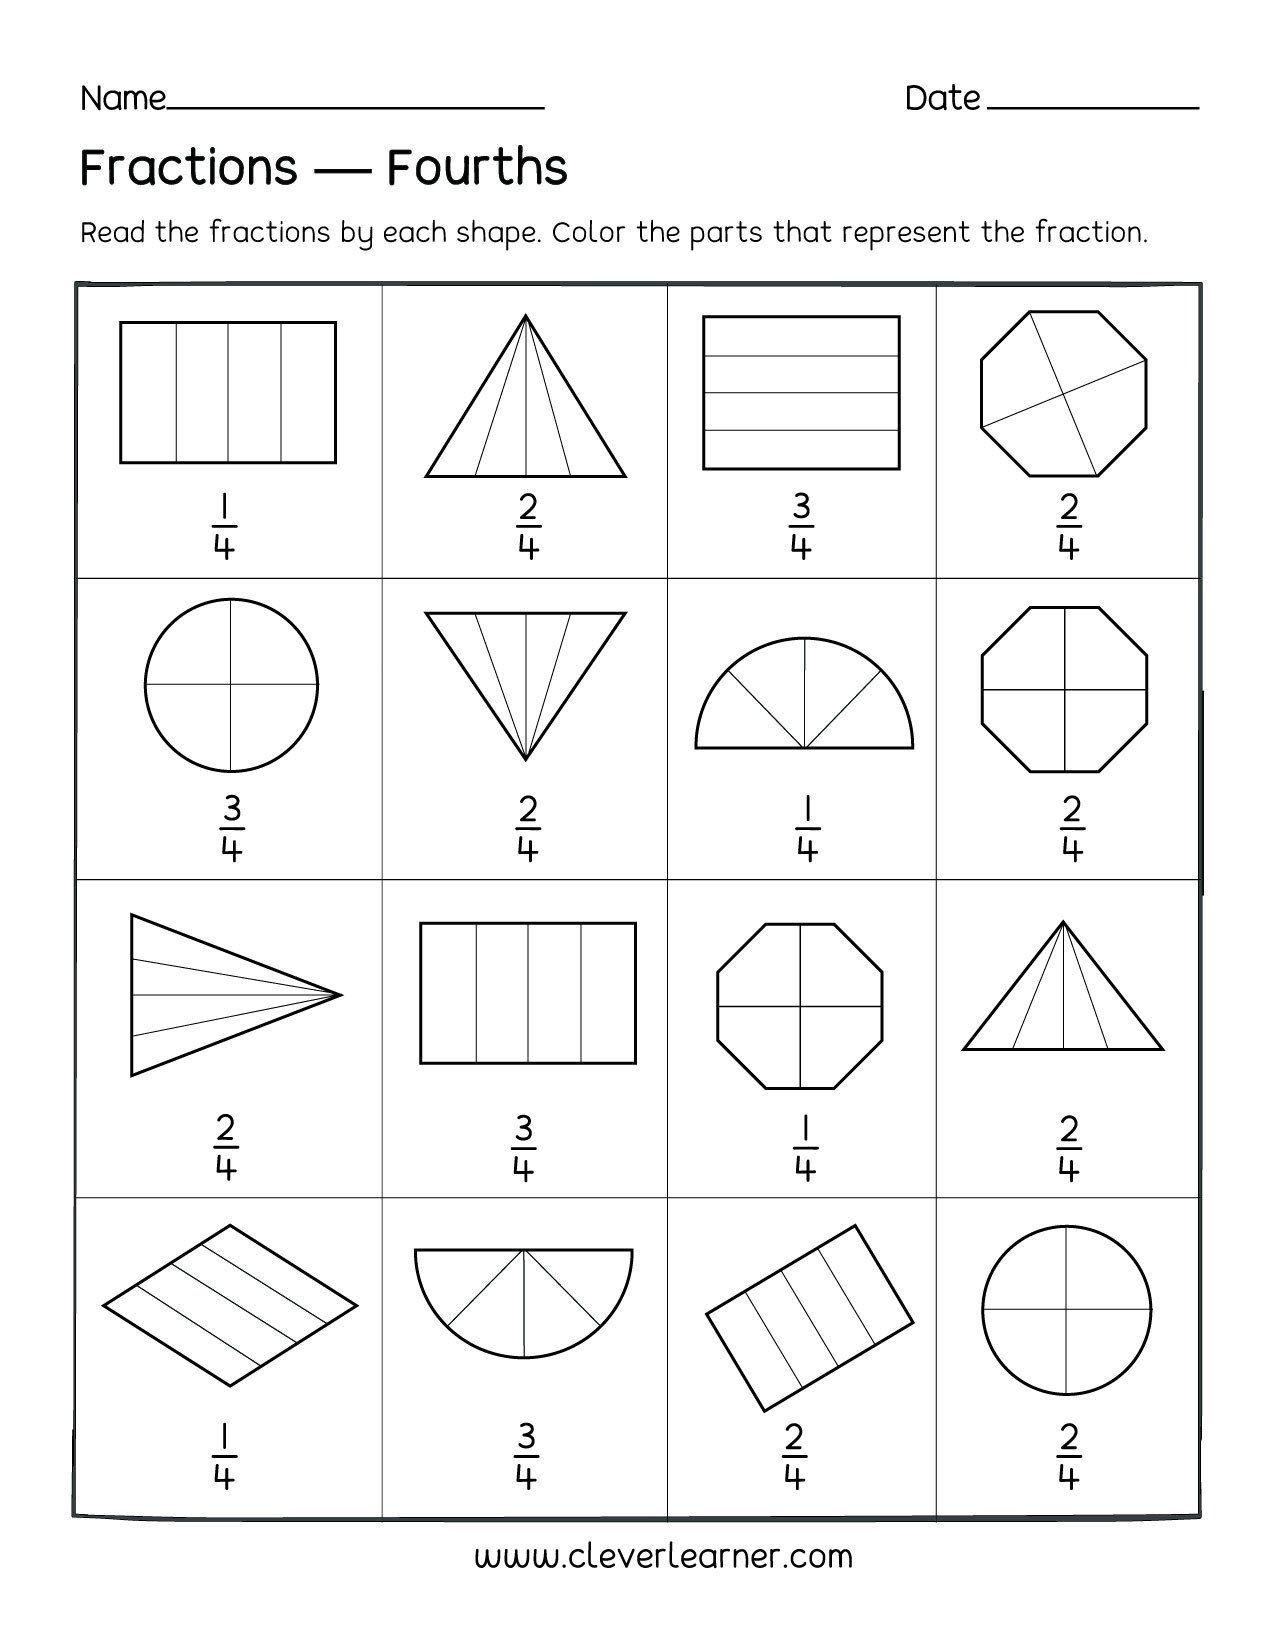 Fraction Worksheets First Grade Fun Activity On Fractions Fourths Worksheets For Children In 2020 Fractions Worksheets First Grade Worksheets 1st Grade Worksheets